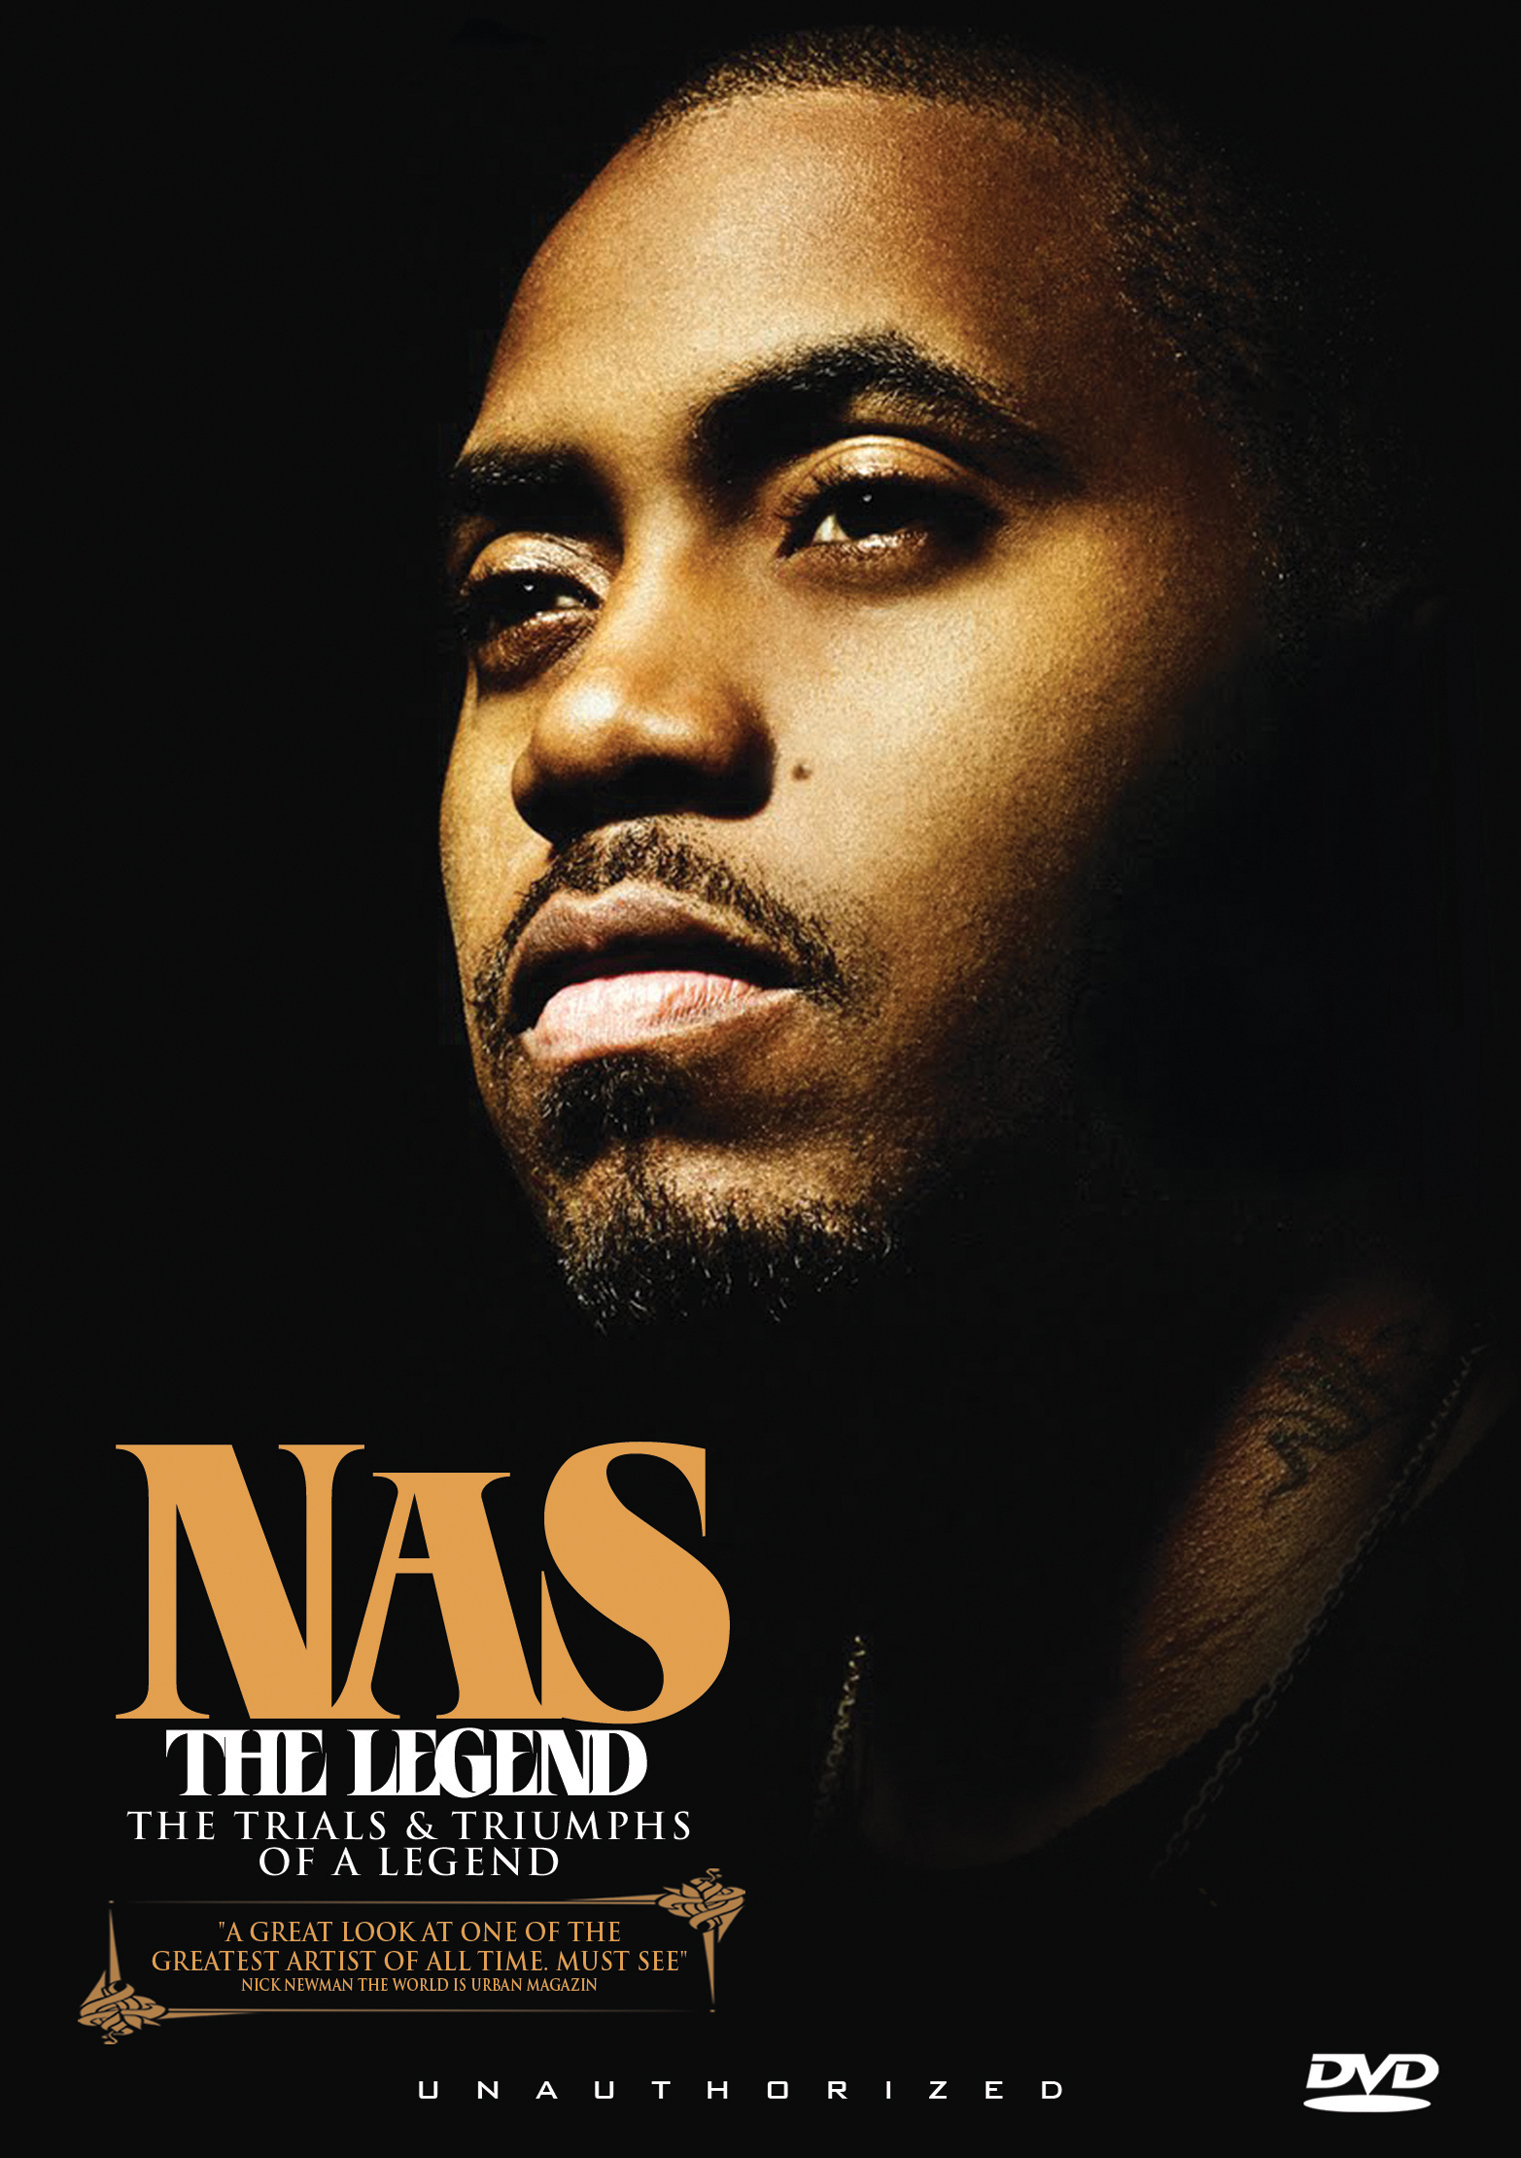 Nas: The Legend - Unauthorized